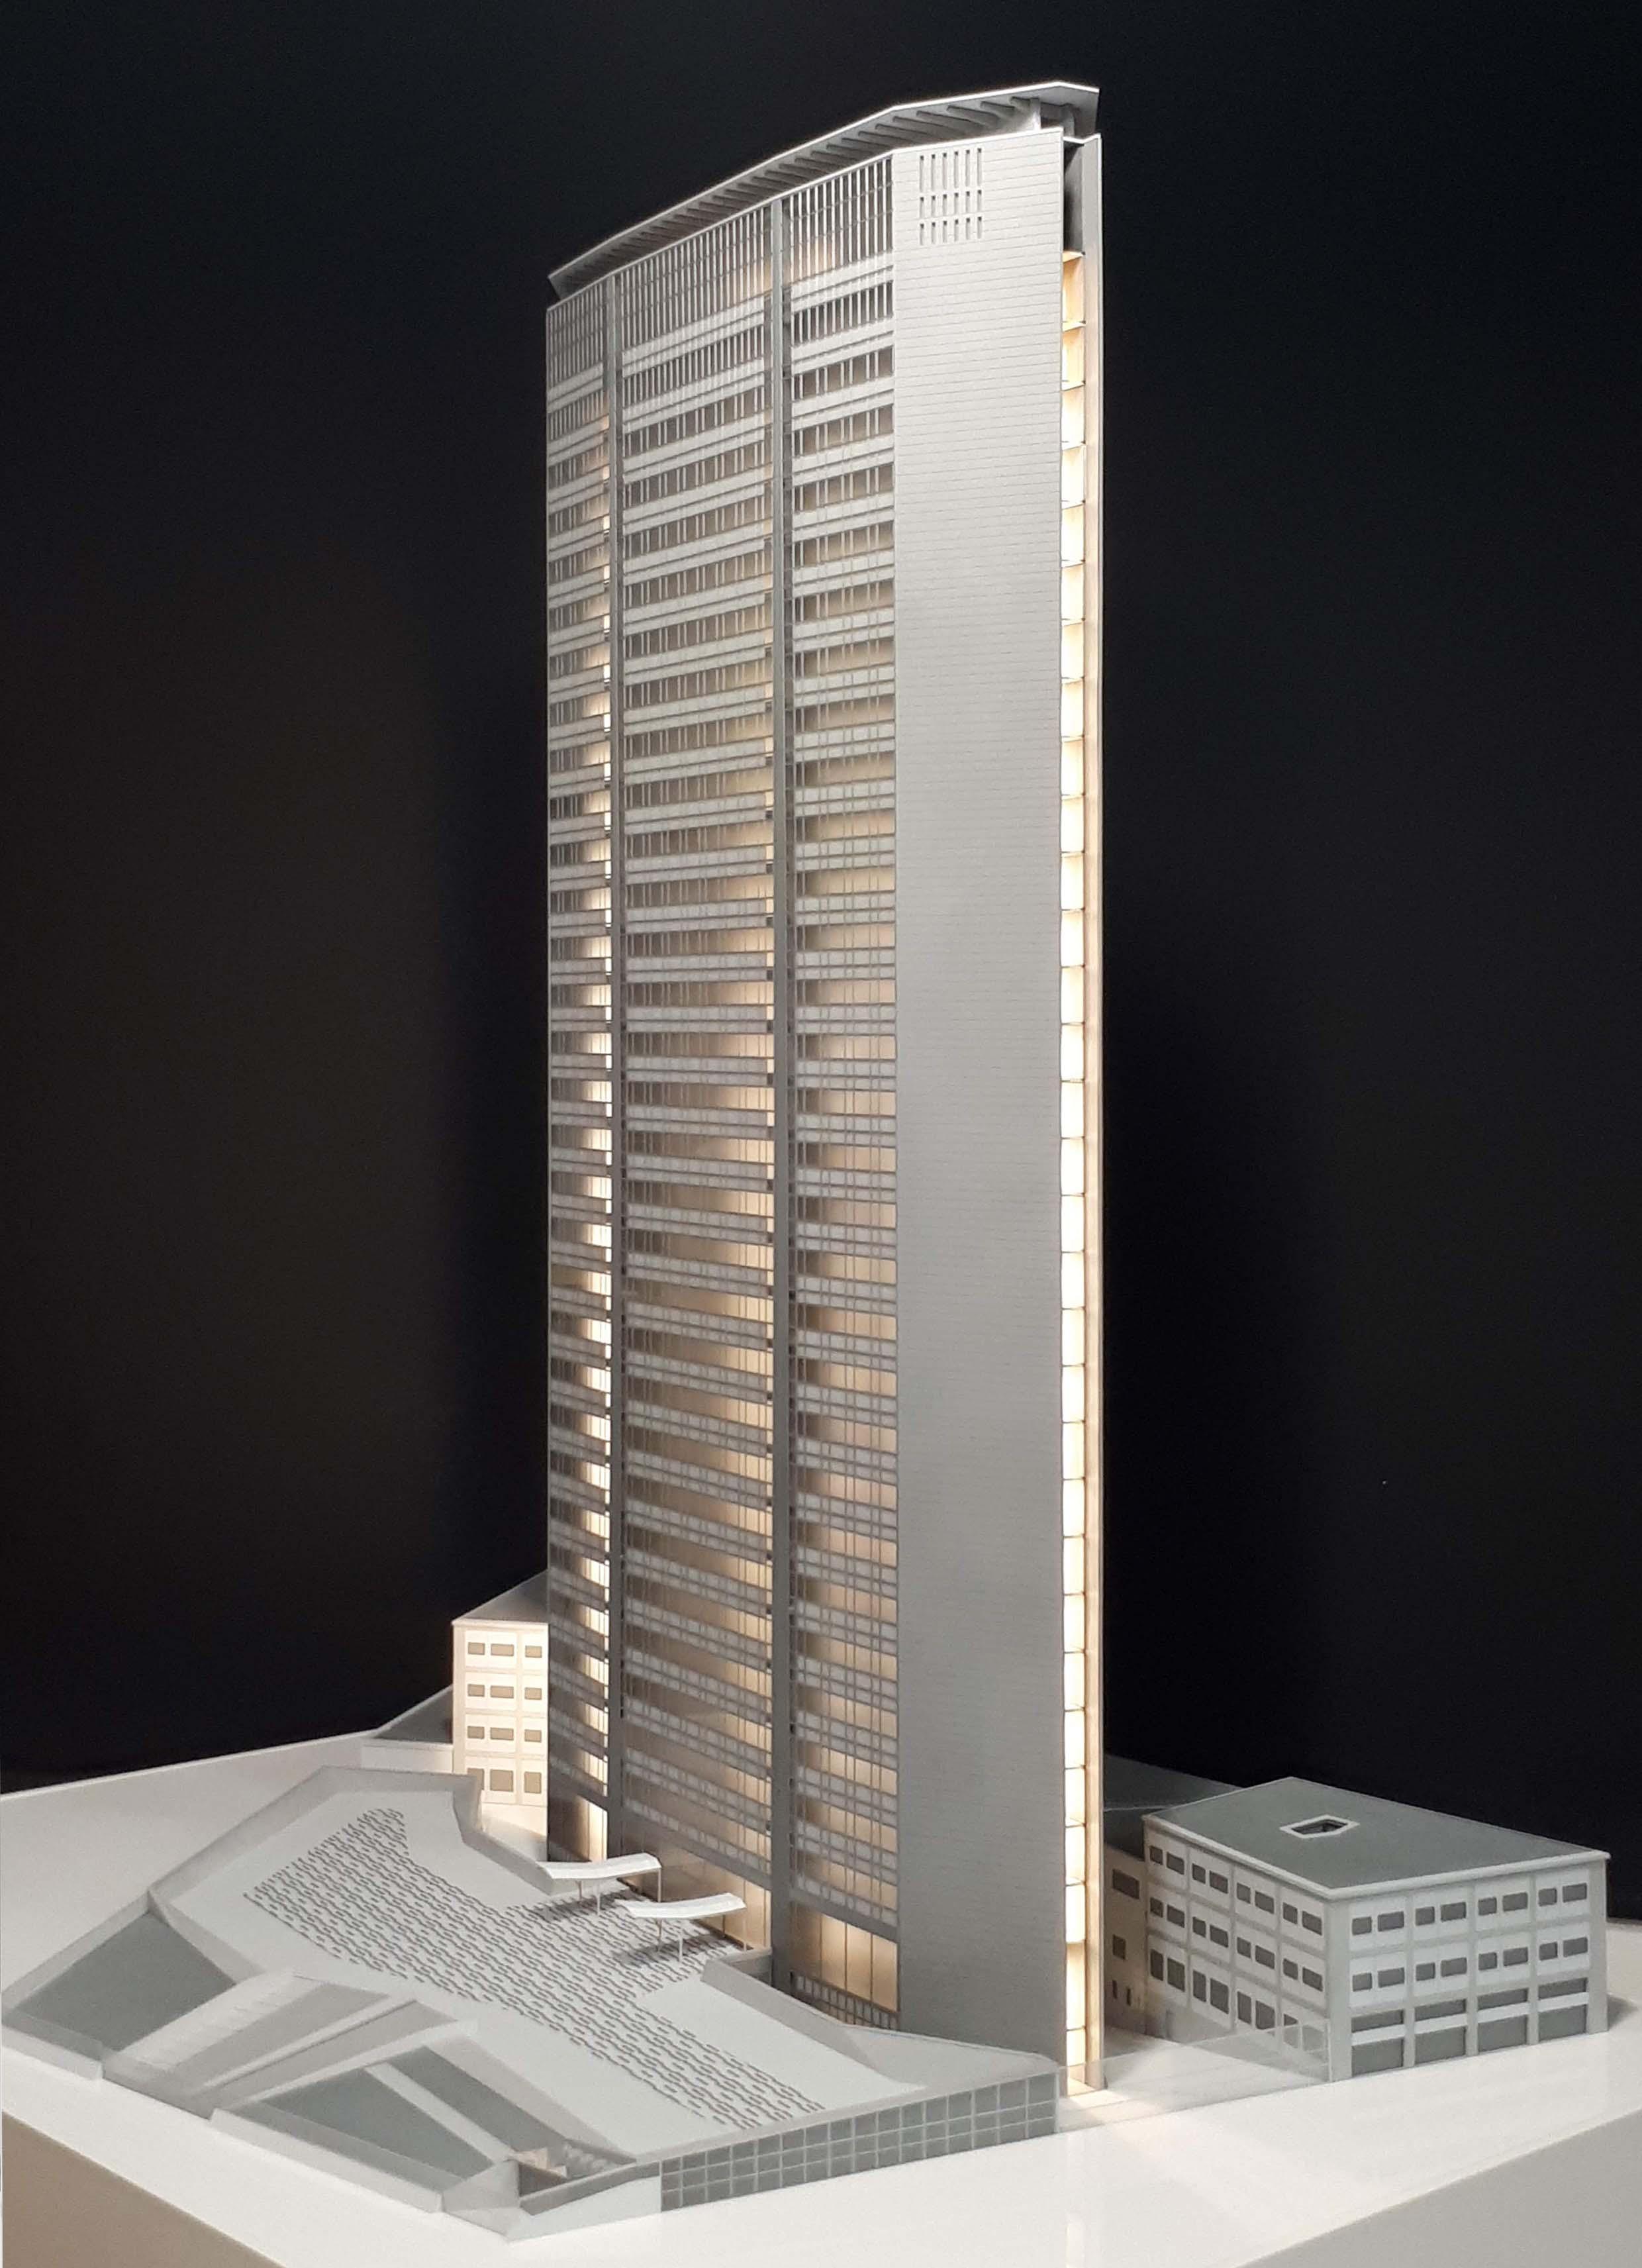 Grattacielo Pirelli, Gio Ponti - Mi